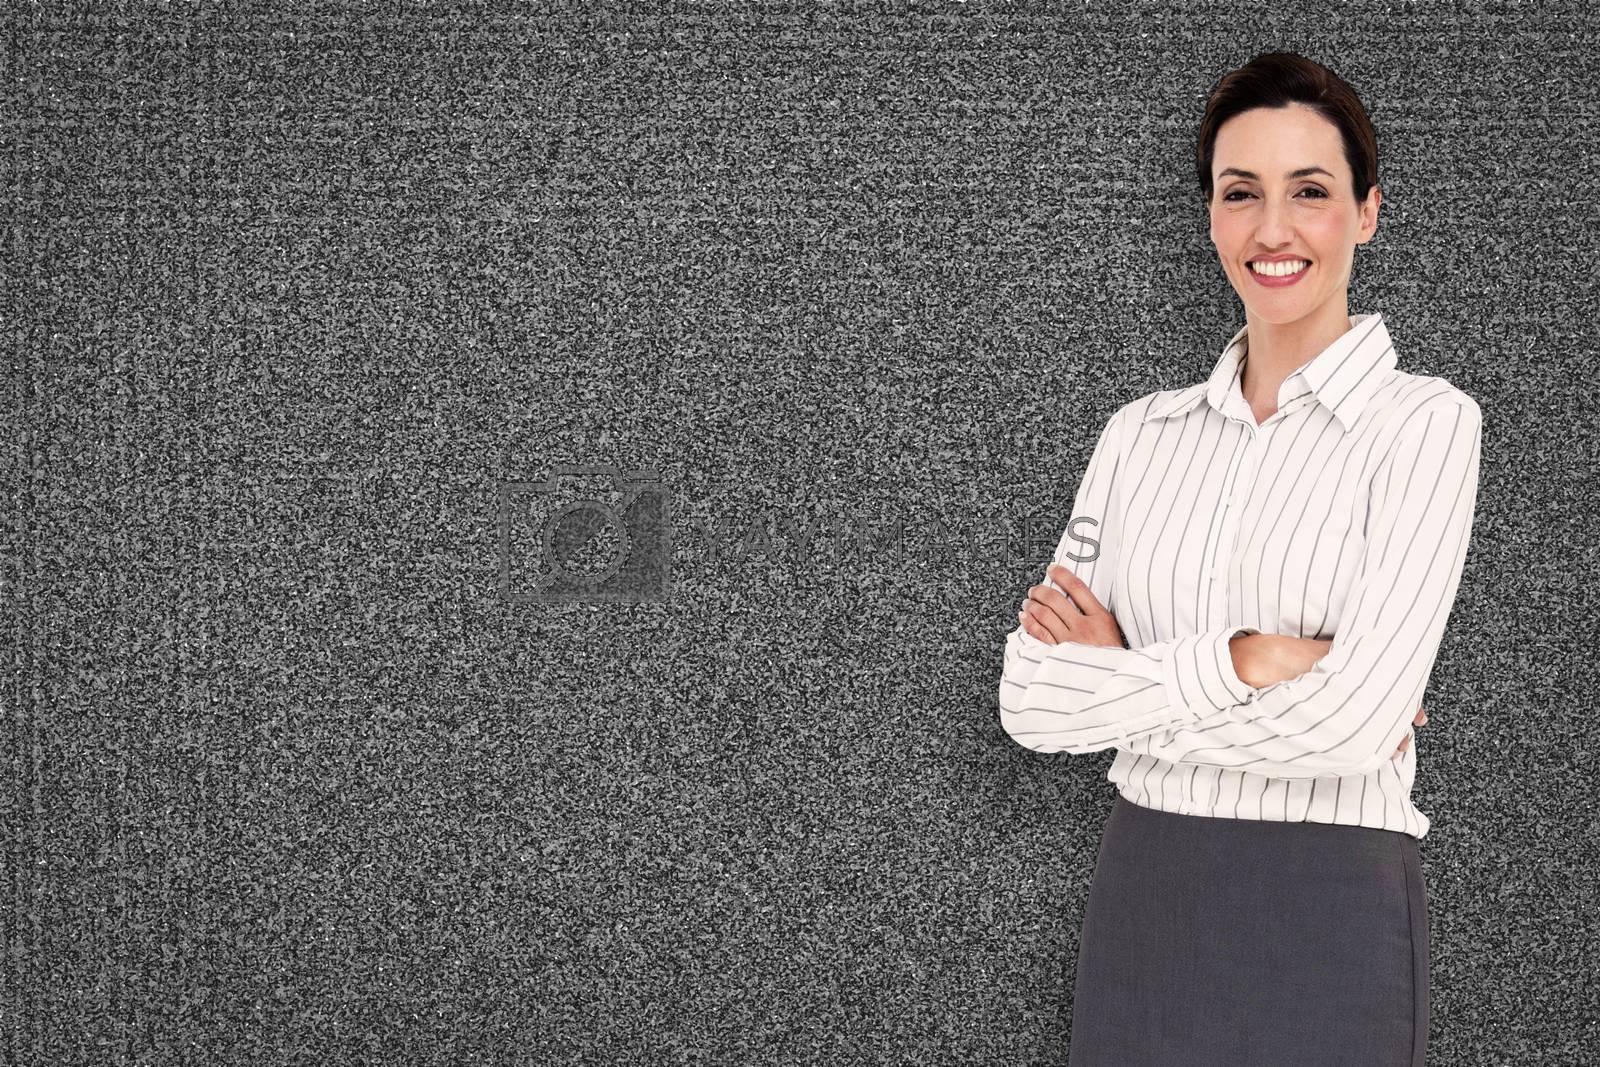 Smiling businesswoman against black background